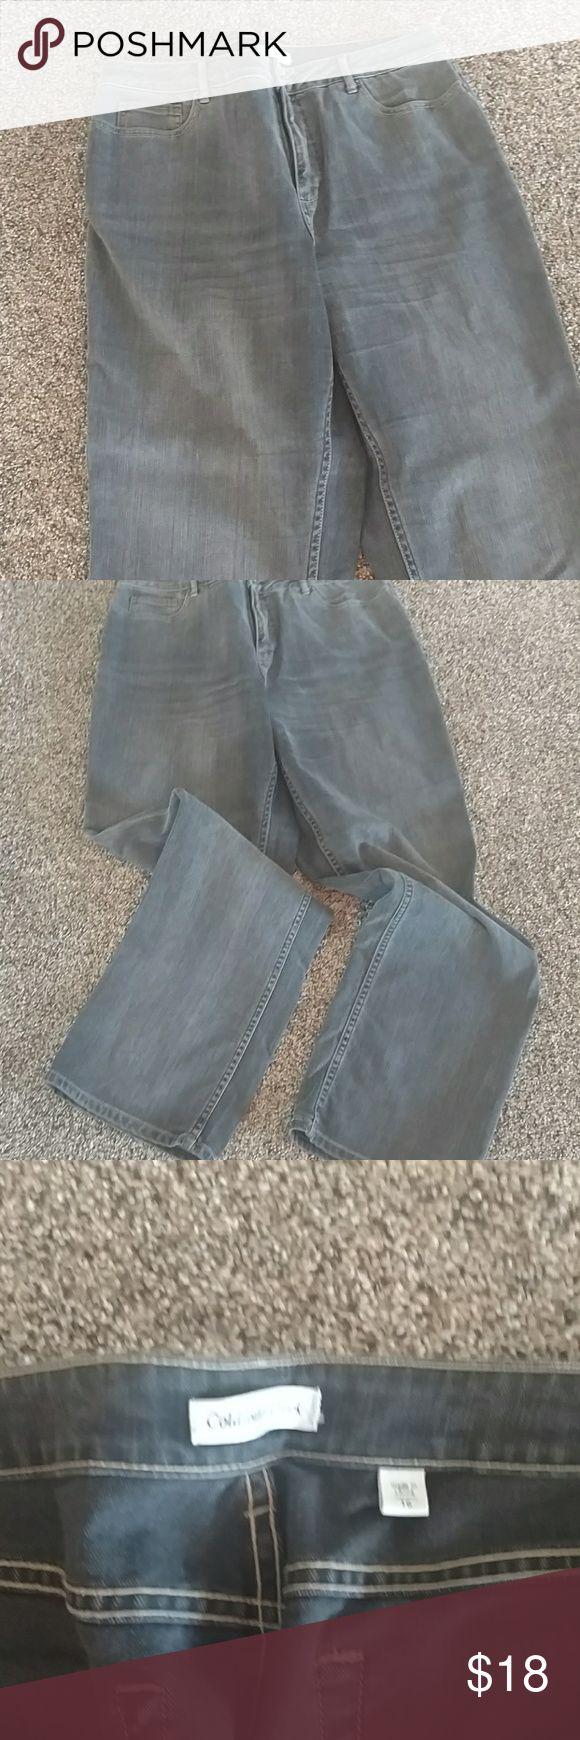 Ladies jeans Dark grey slightly worn excellent condition Coldwater Creek Jeans Straight Leg